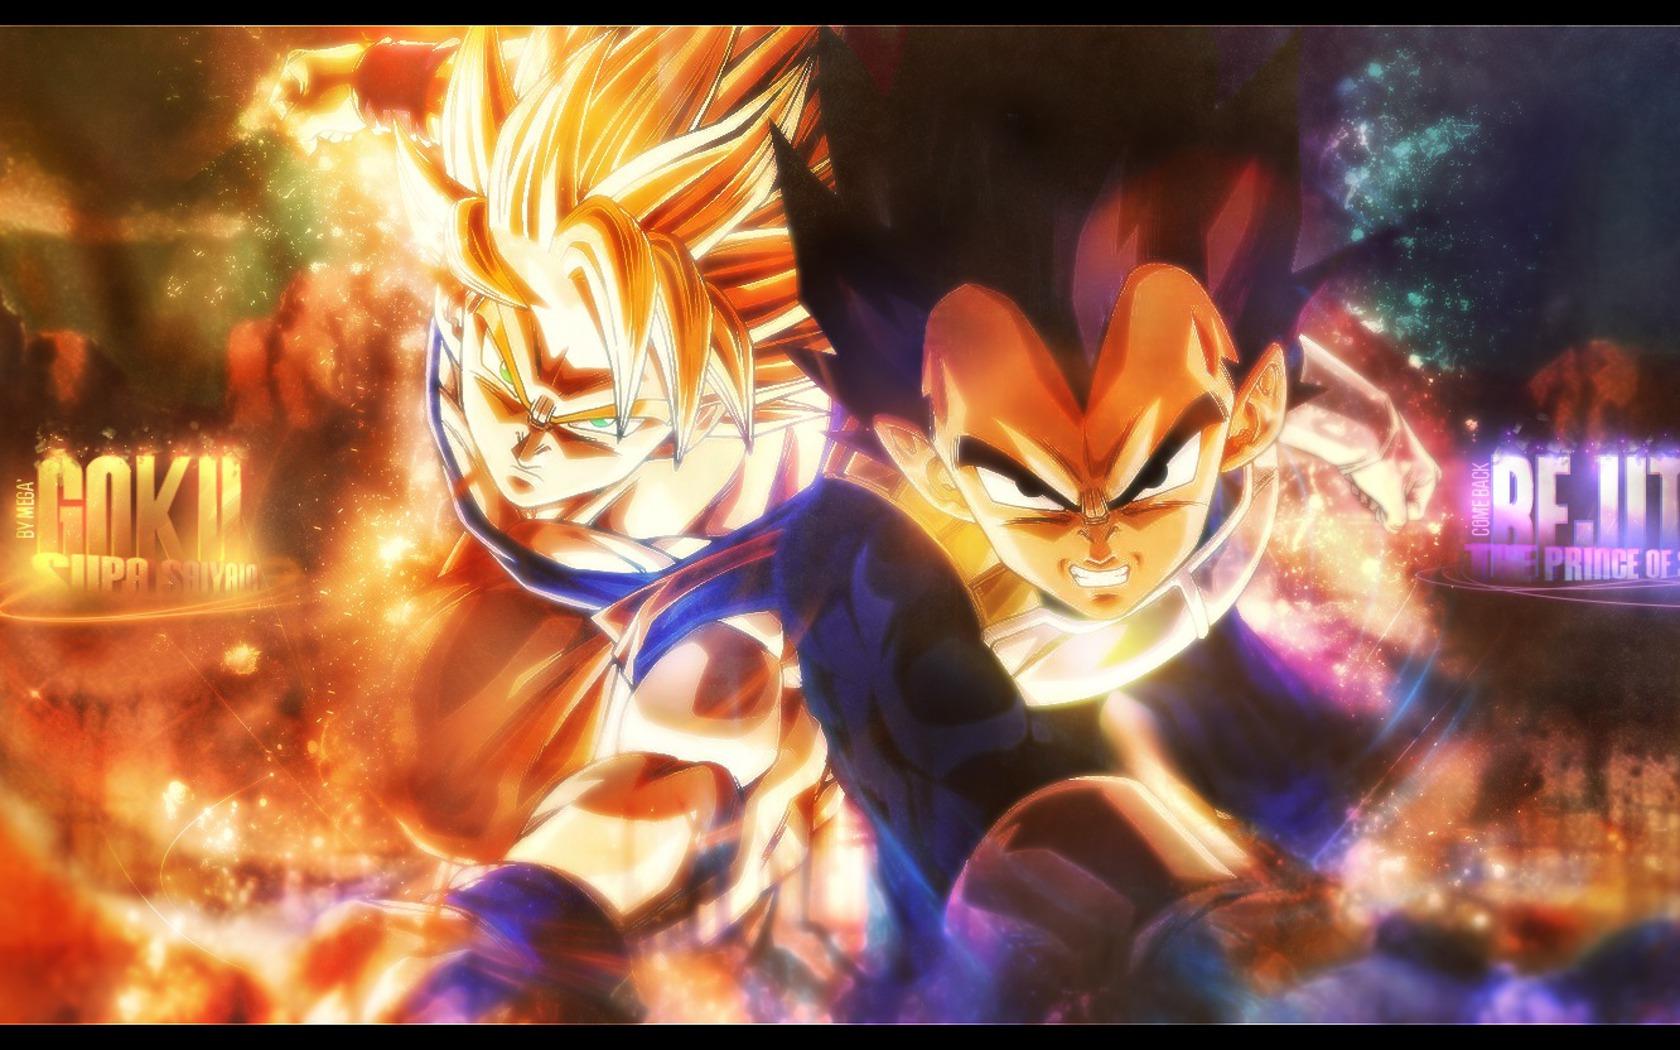 Vegeta Son Wallpaper 1680x1050 Vegeta Son Goku Goku Dragon Ball 1680x1050